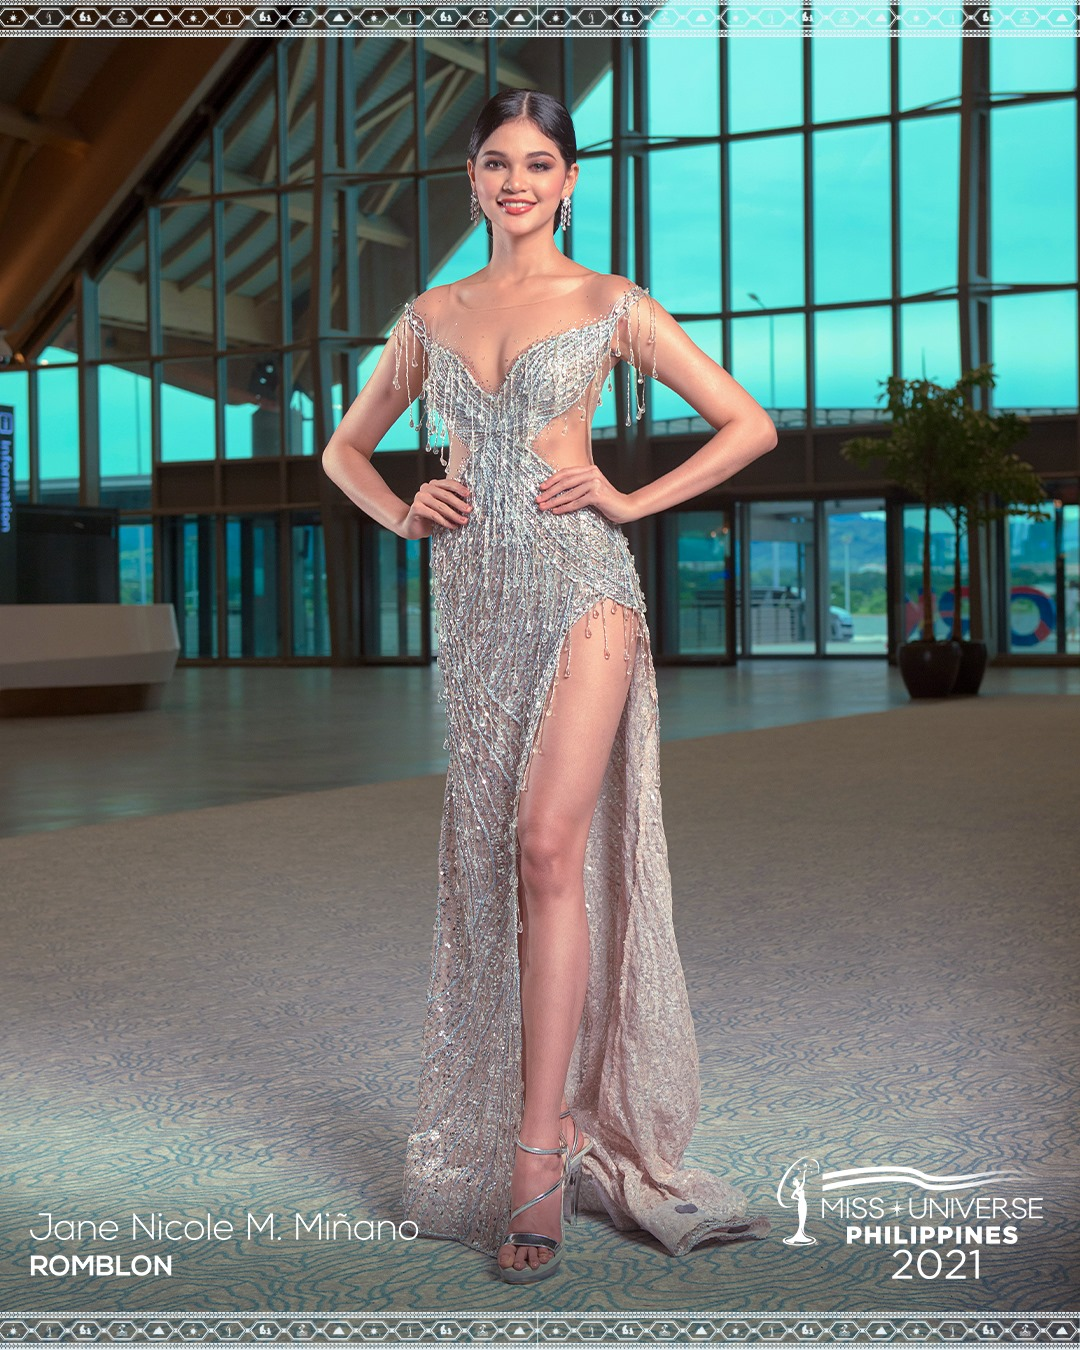 miss-universe-jane-nicole-minano-evening-gown-photo